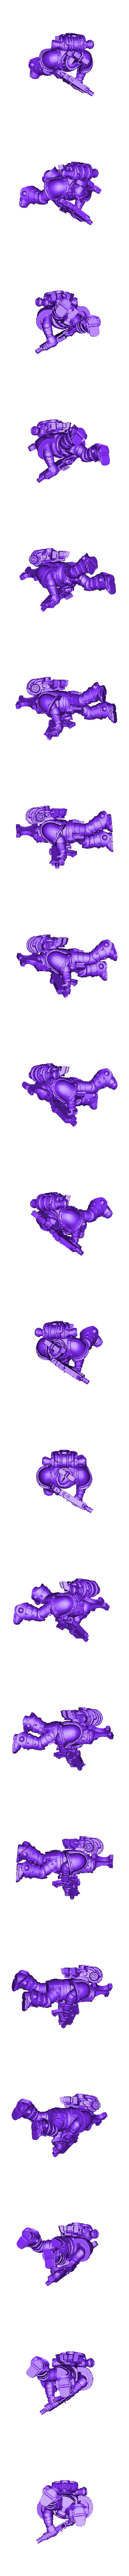 Marine_3v3.stl Download free STL file Rubric Marines • 3D printer design, Mazer